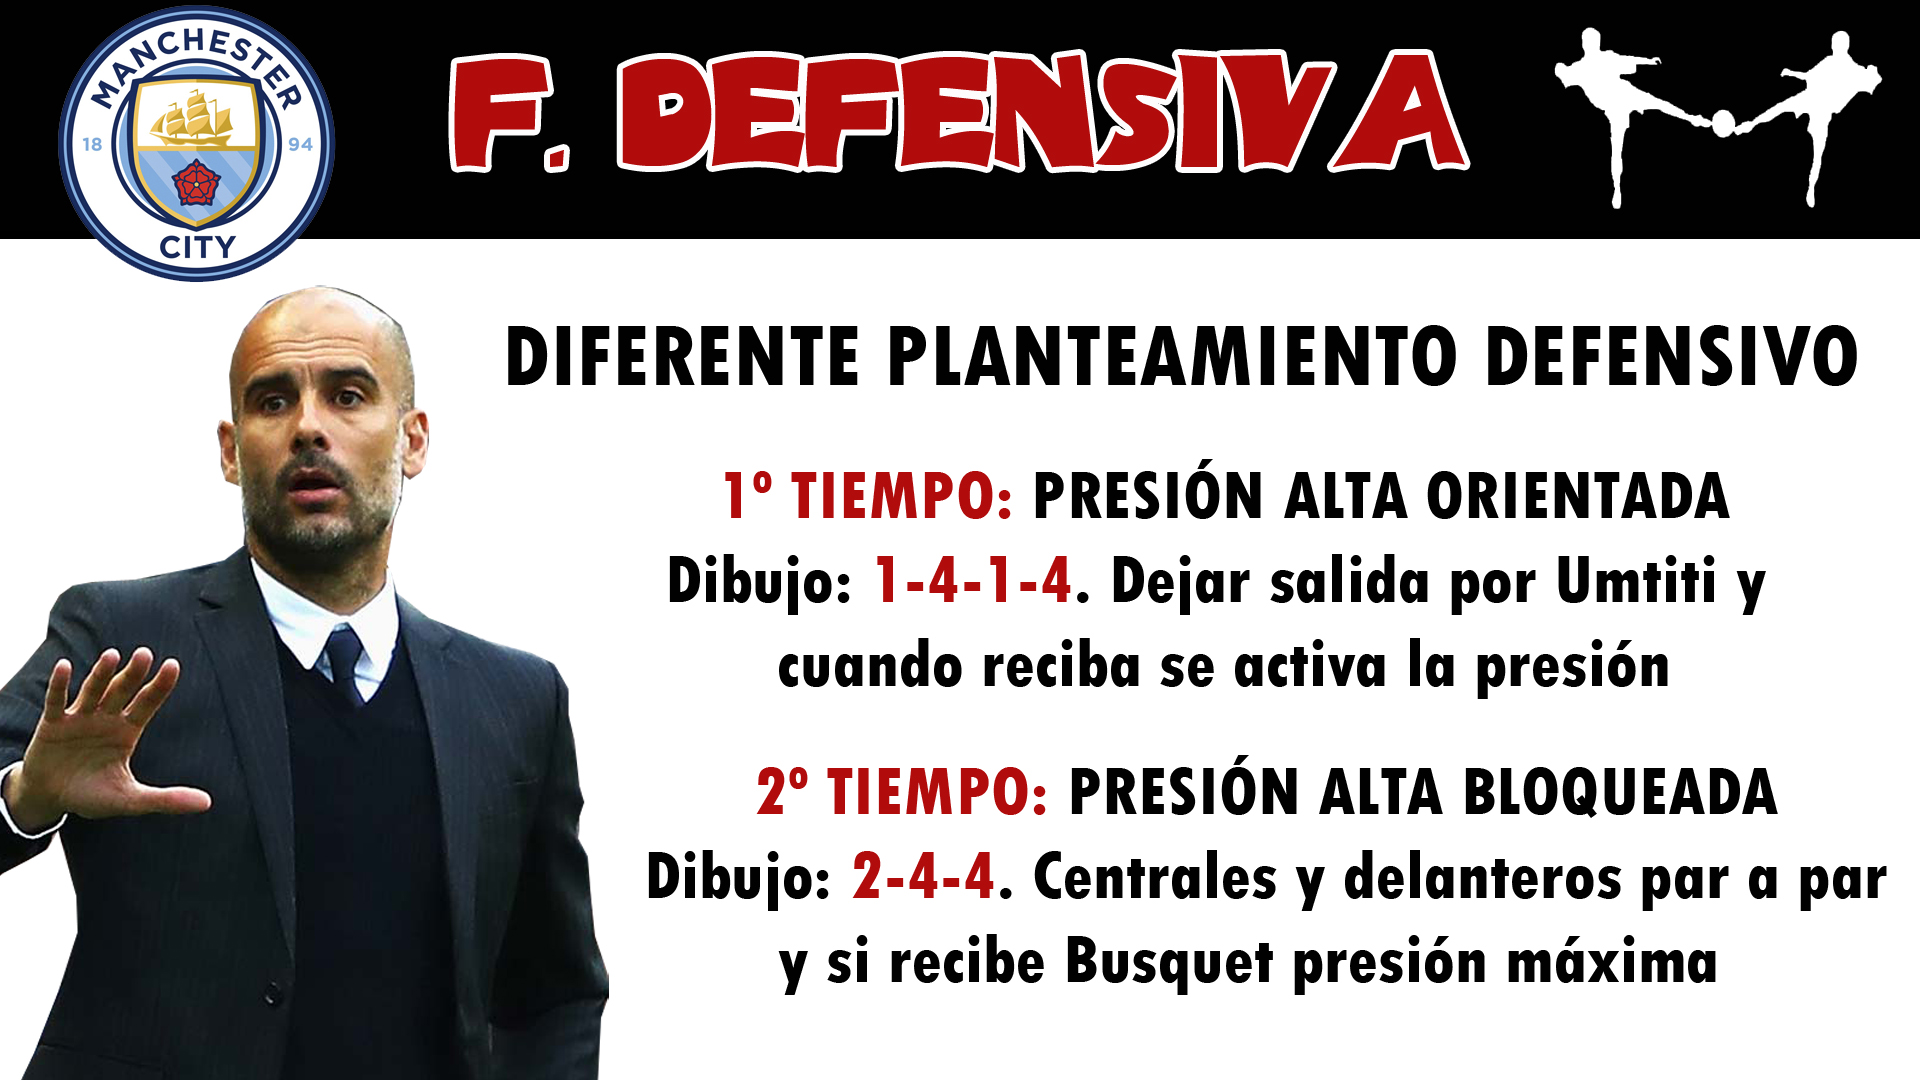 futbolcarrasco analisis tactico manchester city guardiola fc barcelona champions